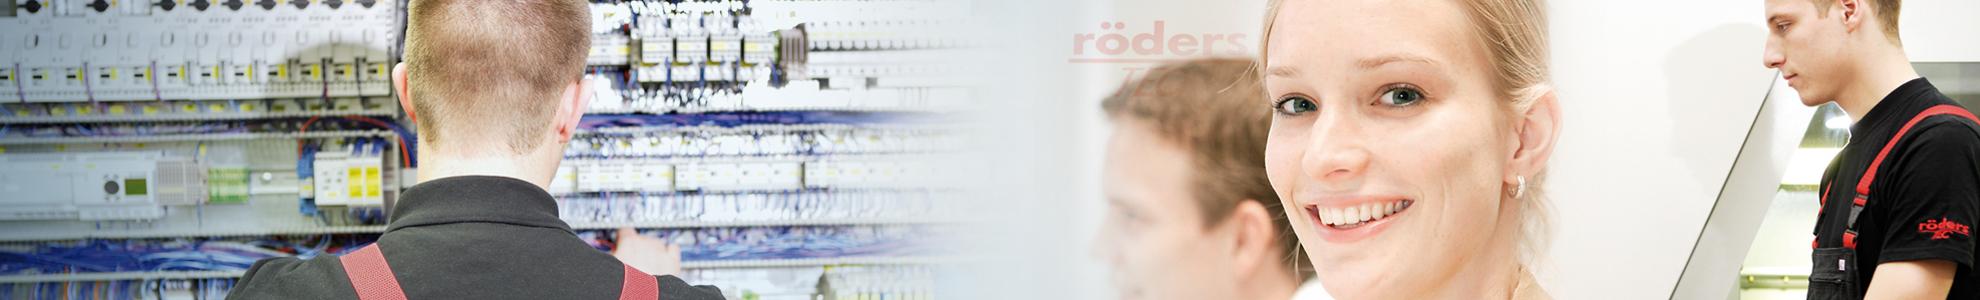 Röders Karriere - Chancen bei Röders